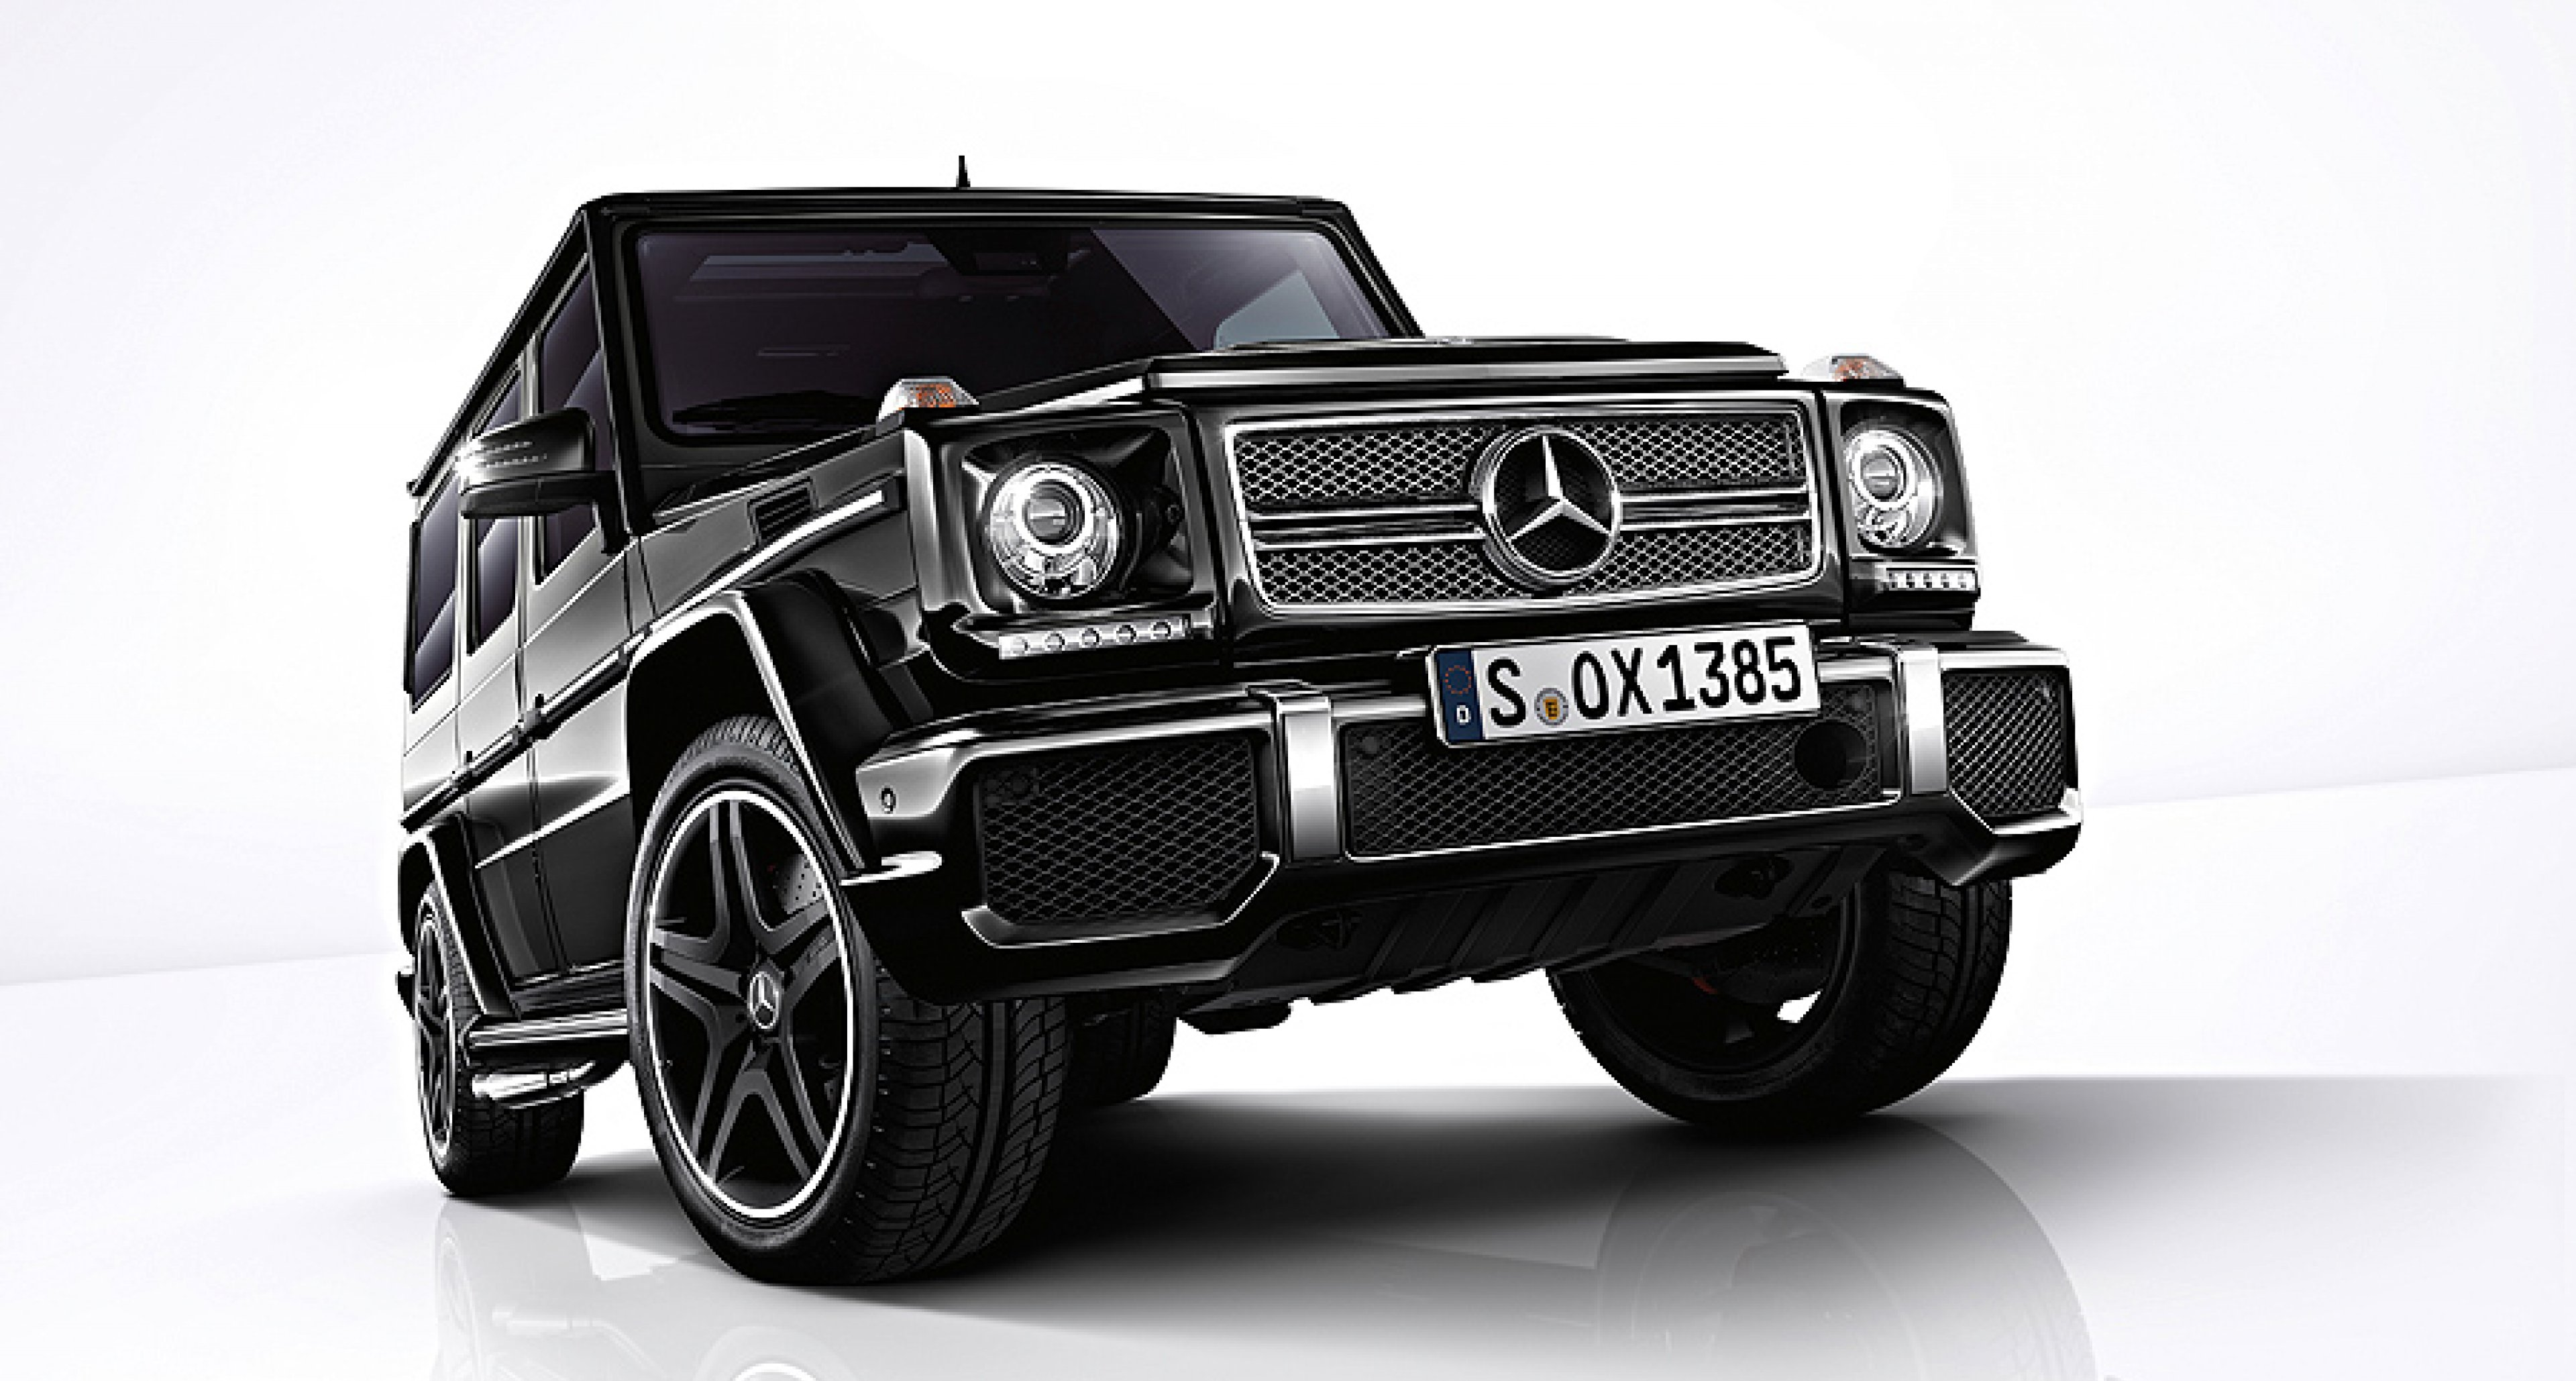 Mercedes-Benz G65 AMG: Stärkster Serien-Offroader der Welt